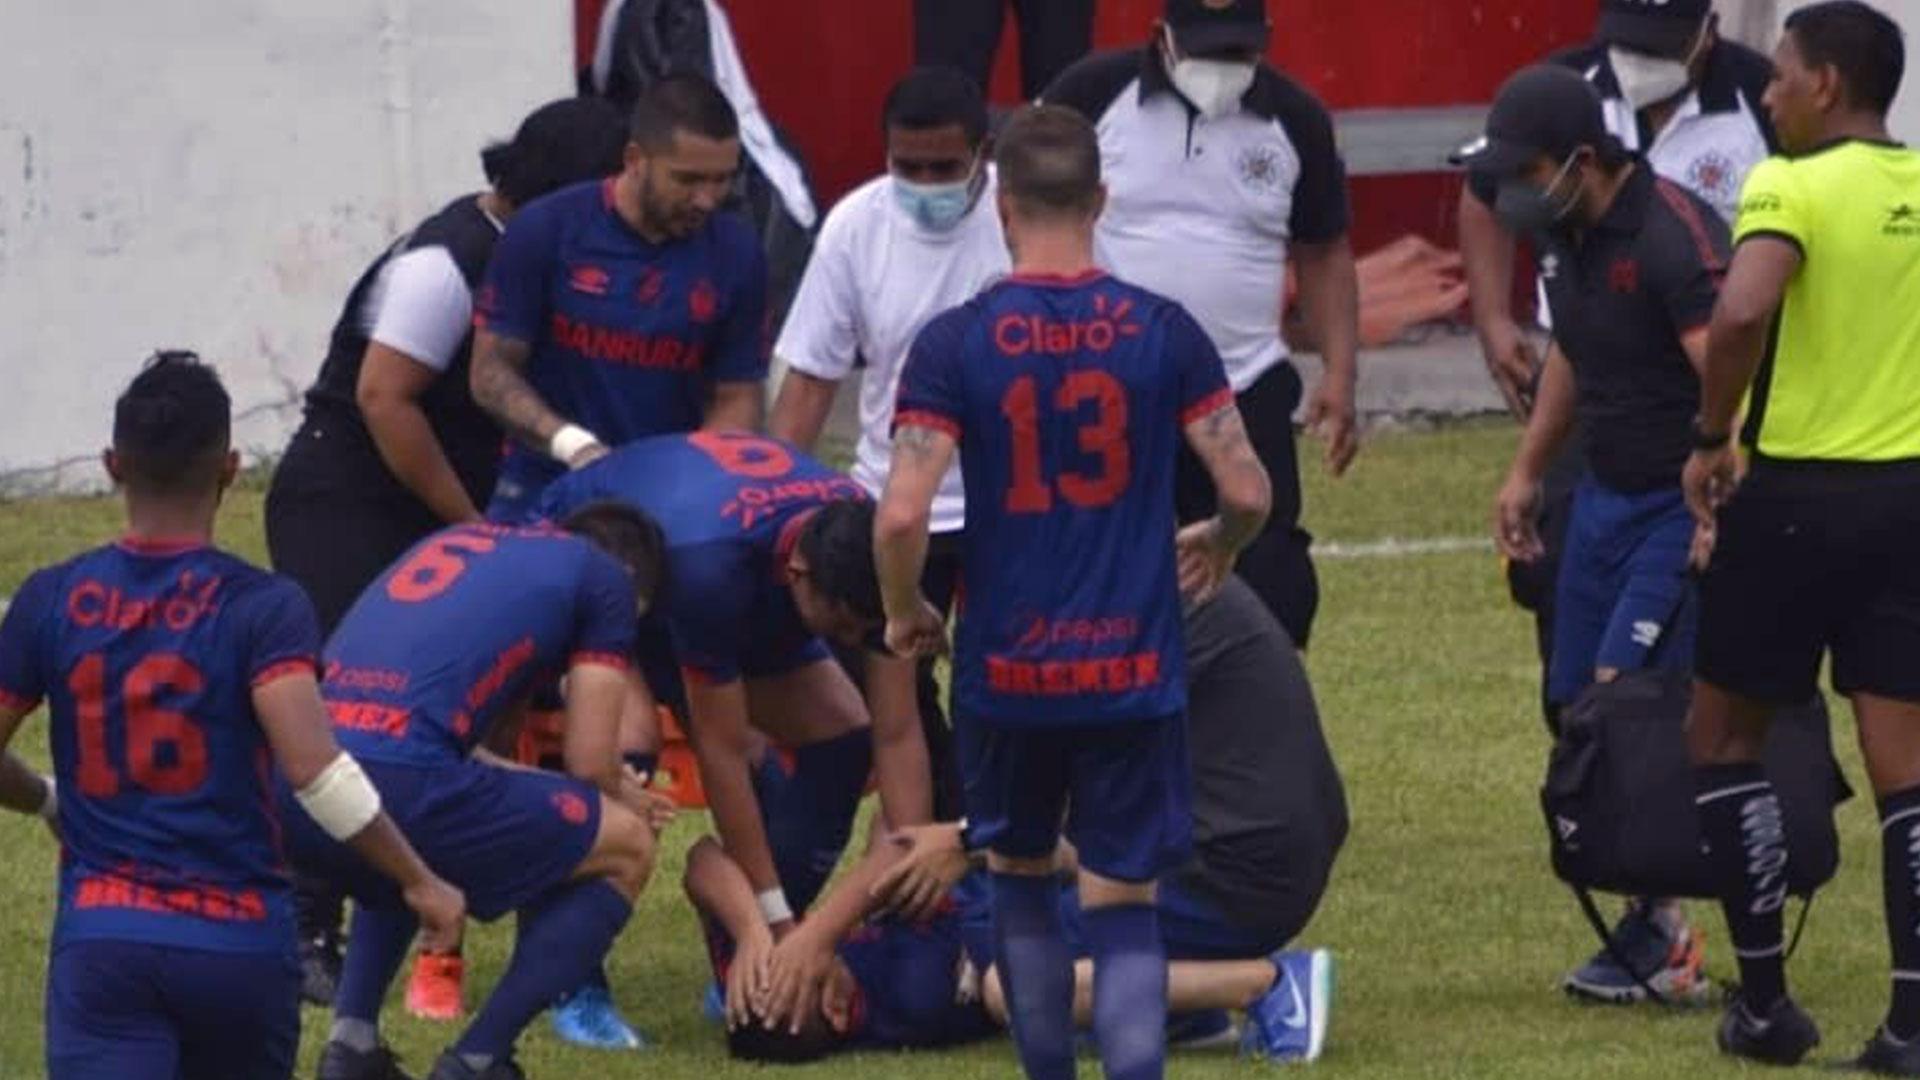 otros accidentes futbolísticos en Guatemala - Prensa Libre